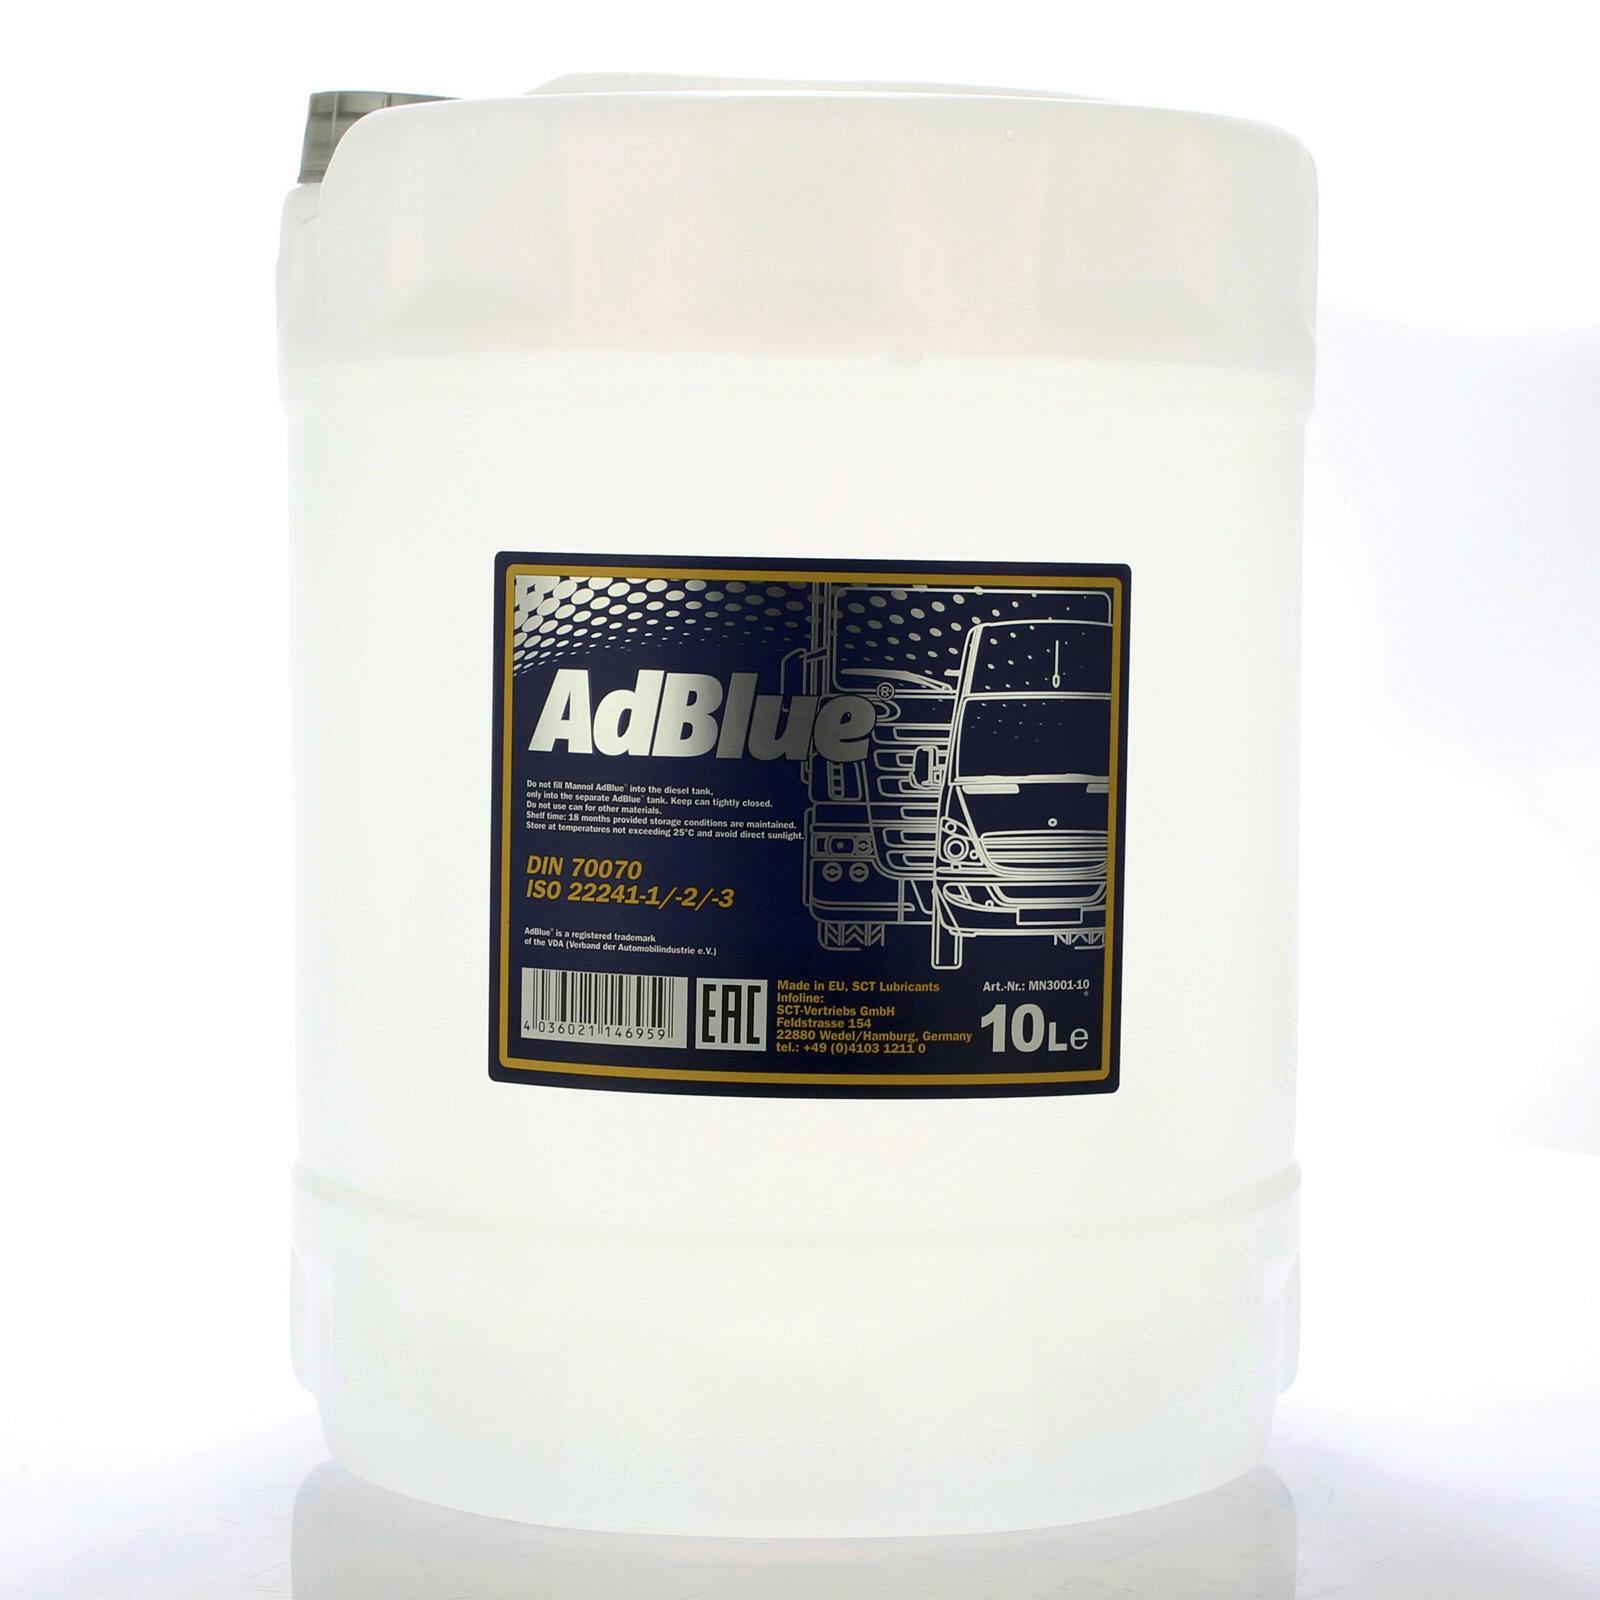 Adblue Dieseladditiv 10L